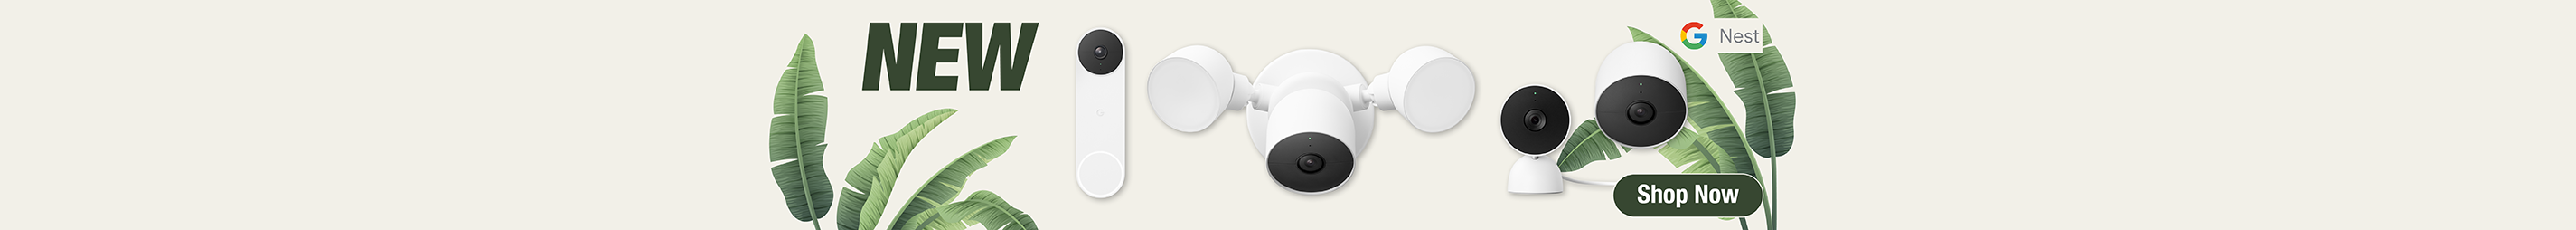 Shop New Google Nest